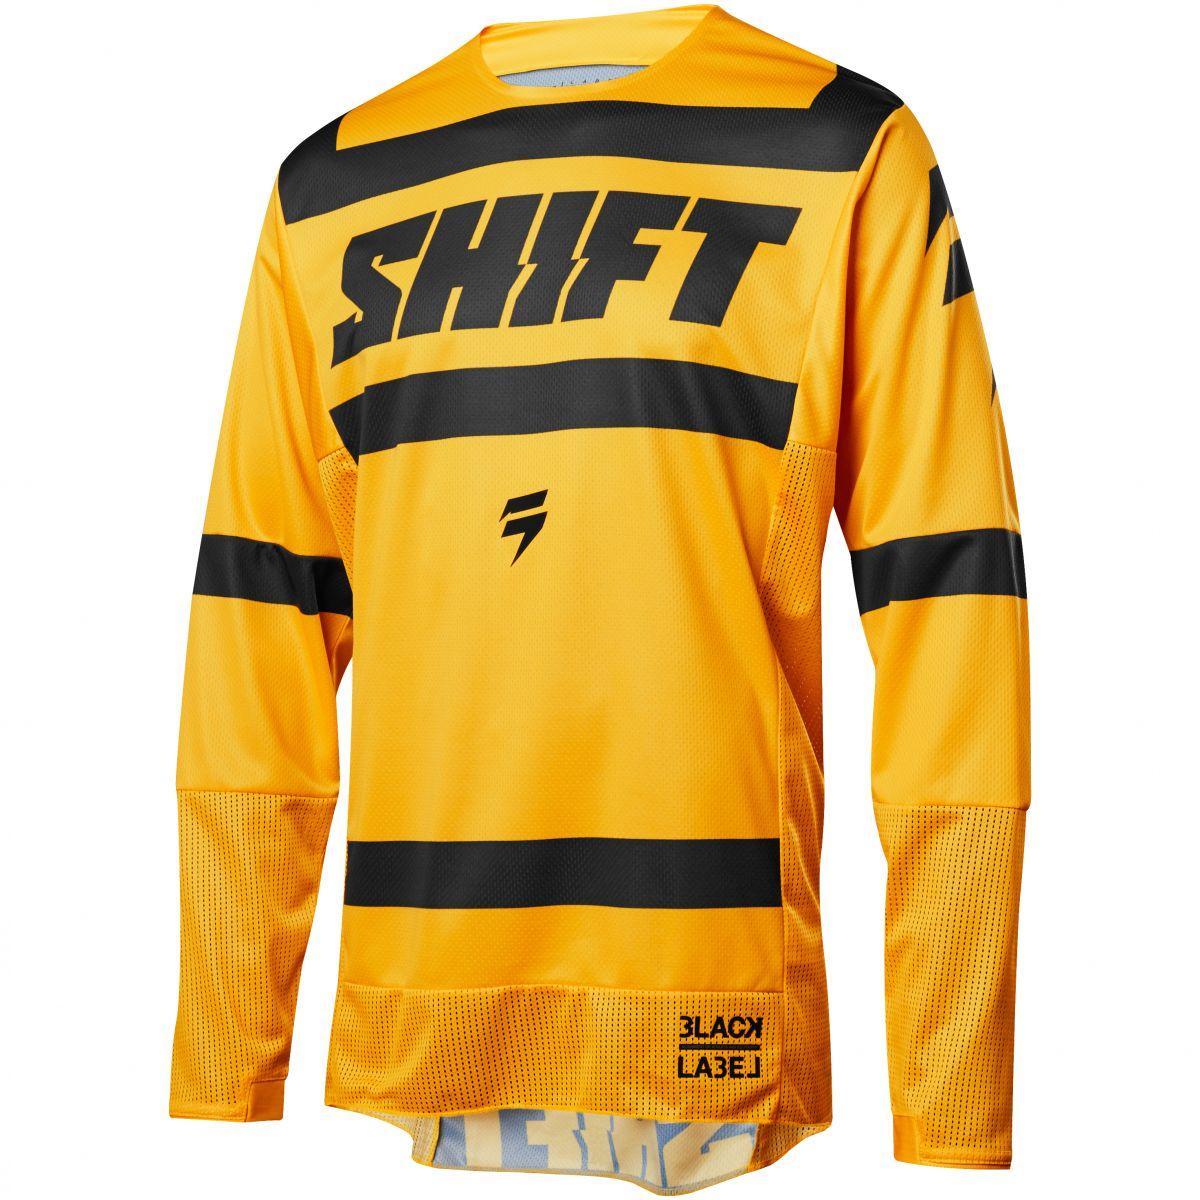 Shift - 2018 3Lack Label Strike джерси, желтое